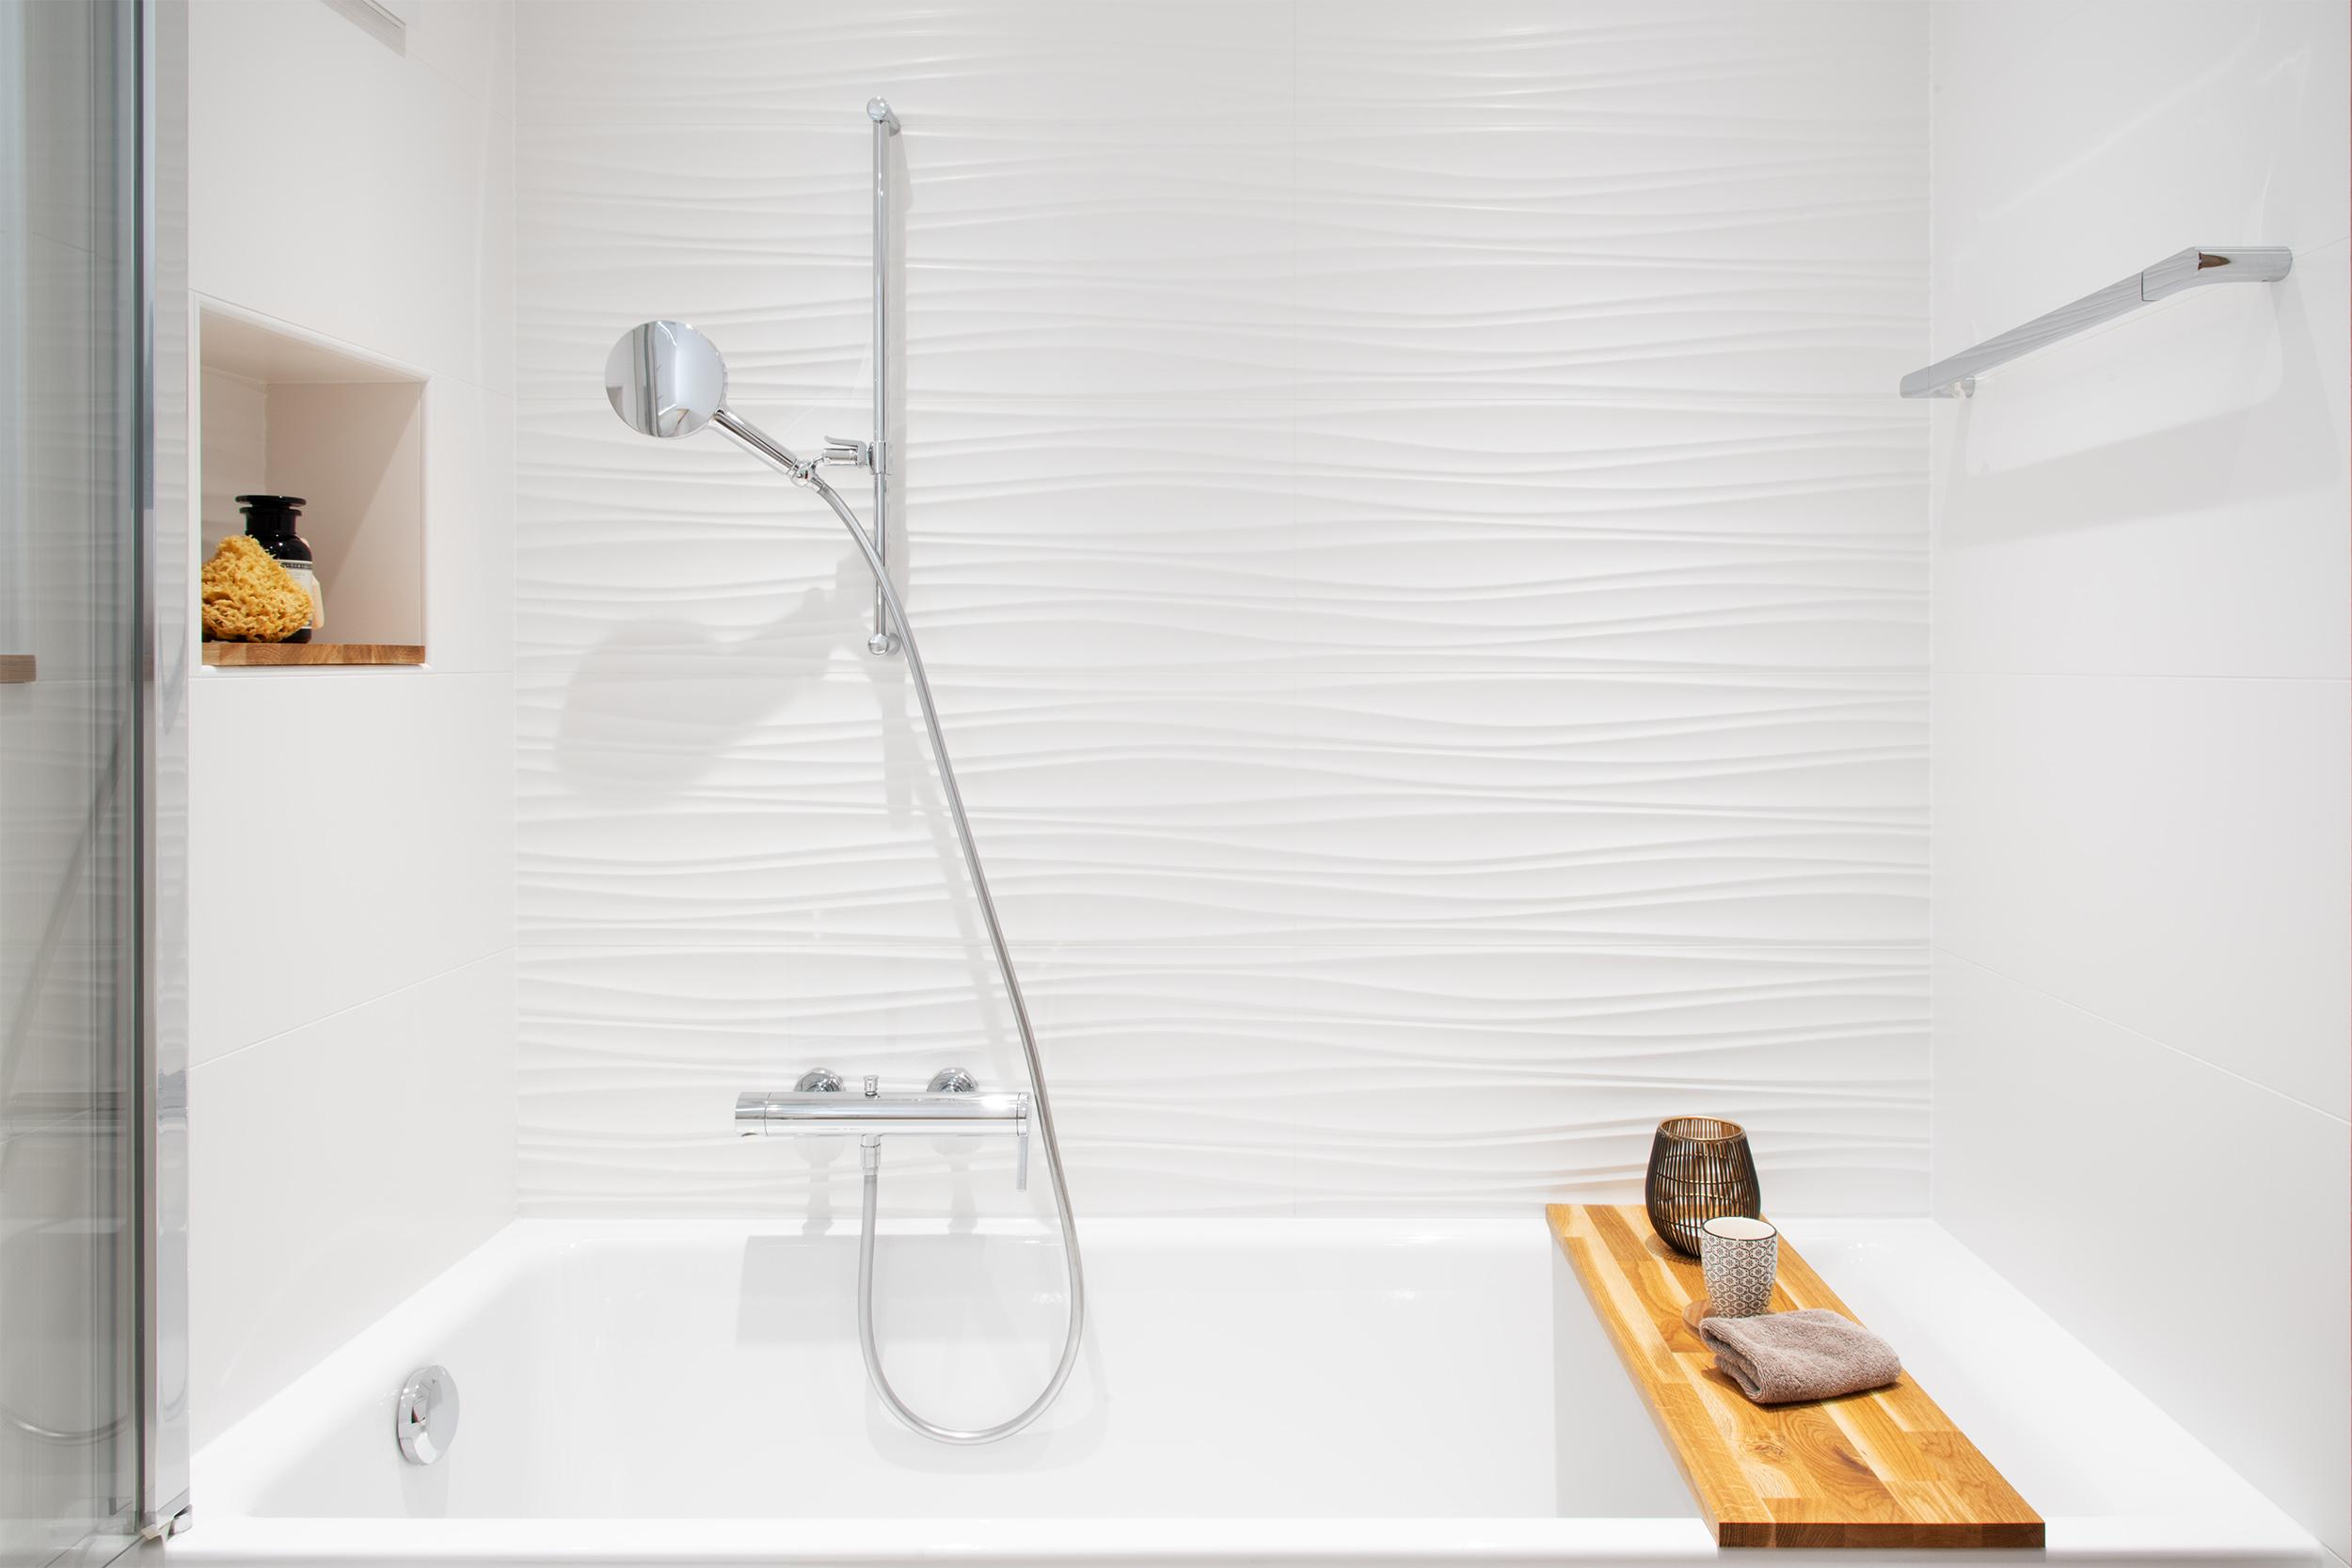 Salle de bain; architecture interieur; Atelier Interior Design